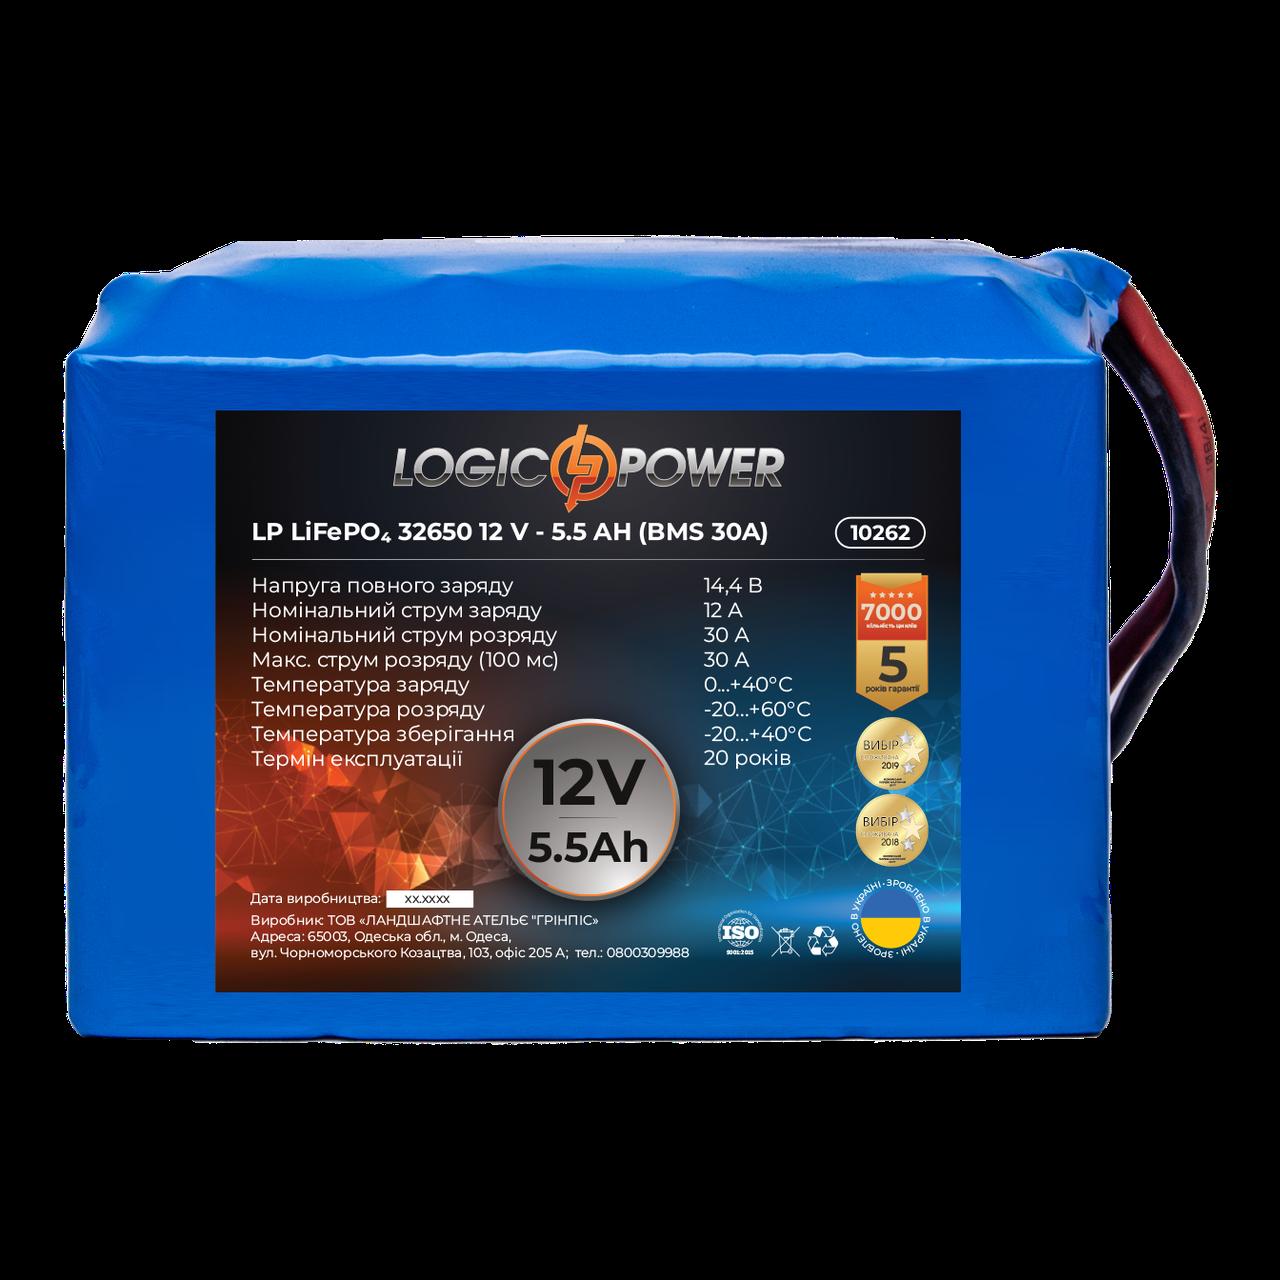 Акумулятор LP LiFePo-4 48 V - 90 Ah (BMS 60A) (2-й форм-фактор)